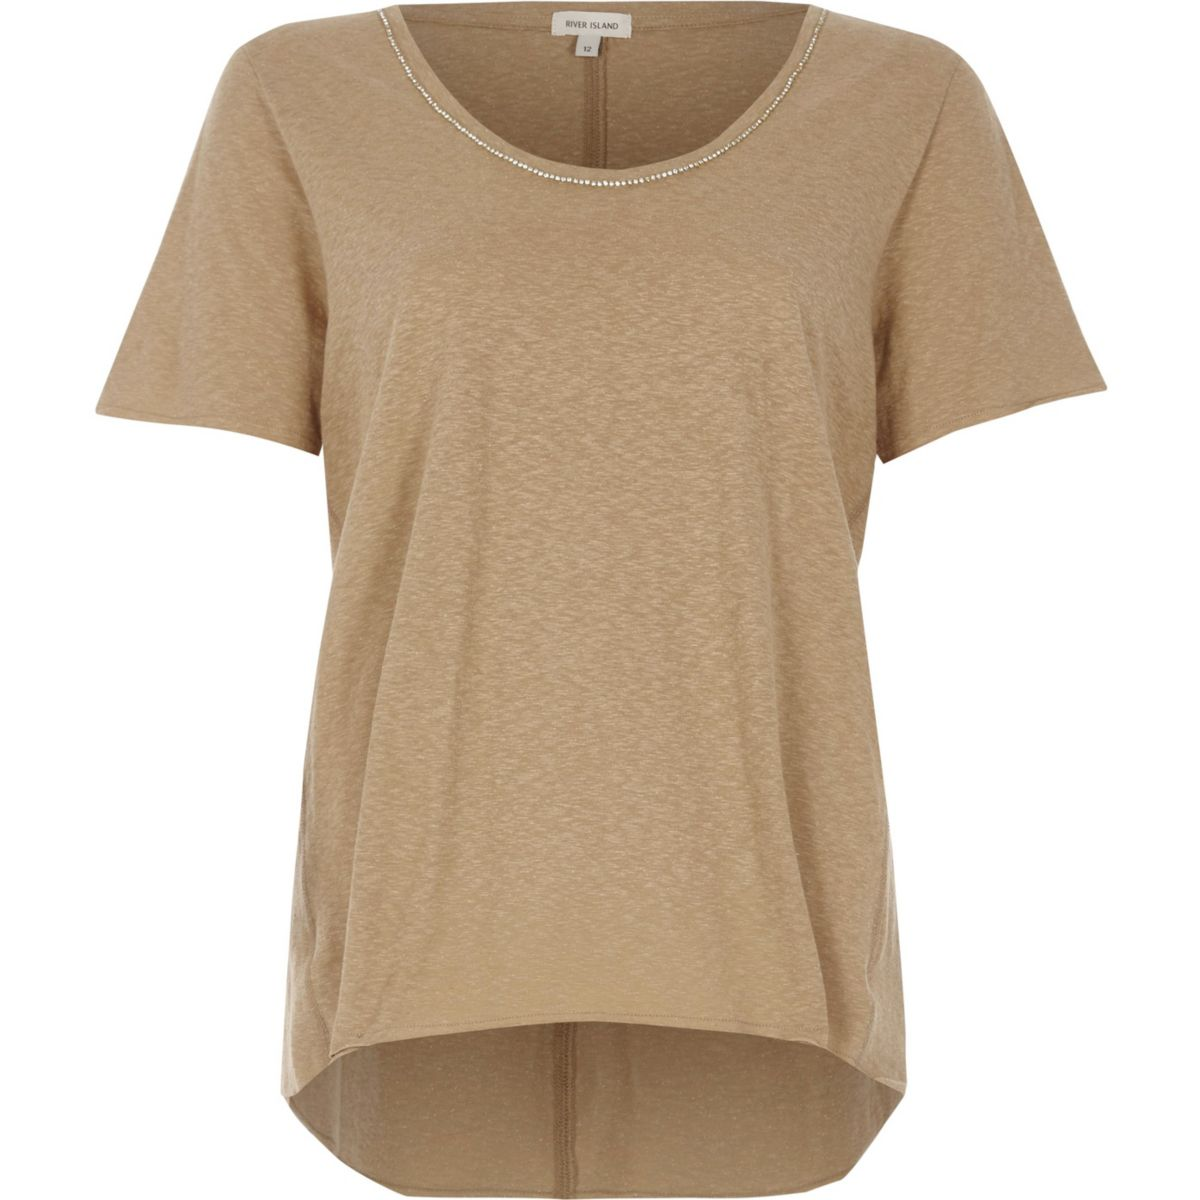 Beiges Oversized-T-Shirt